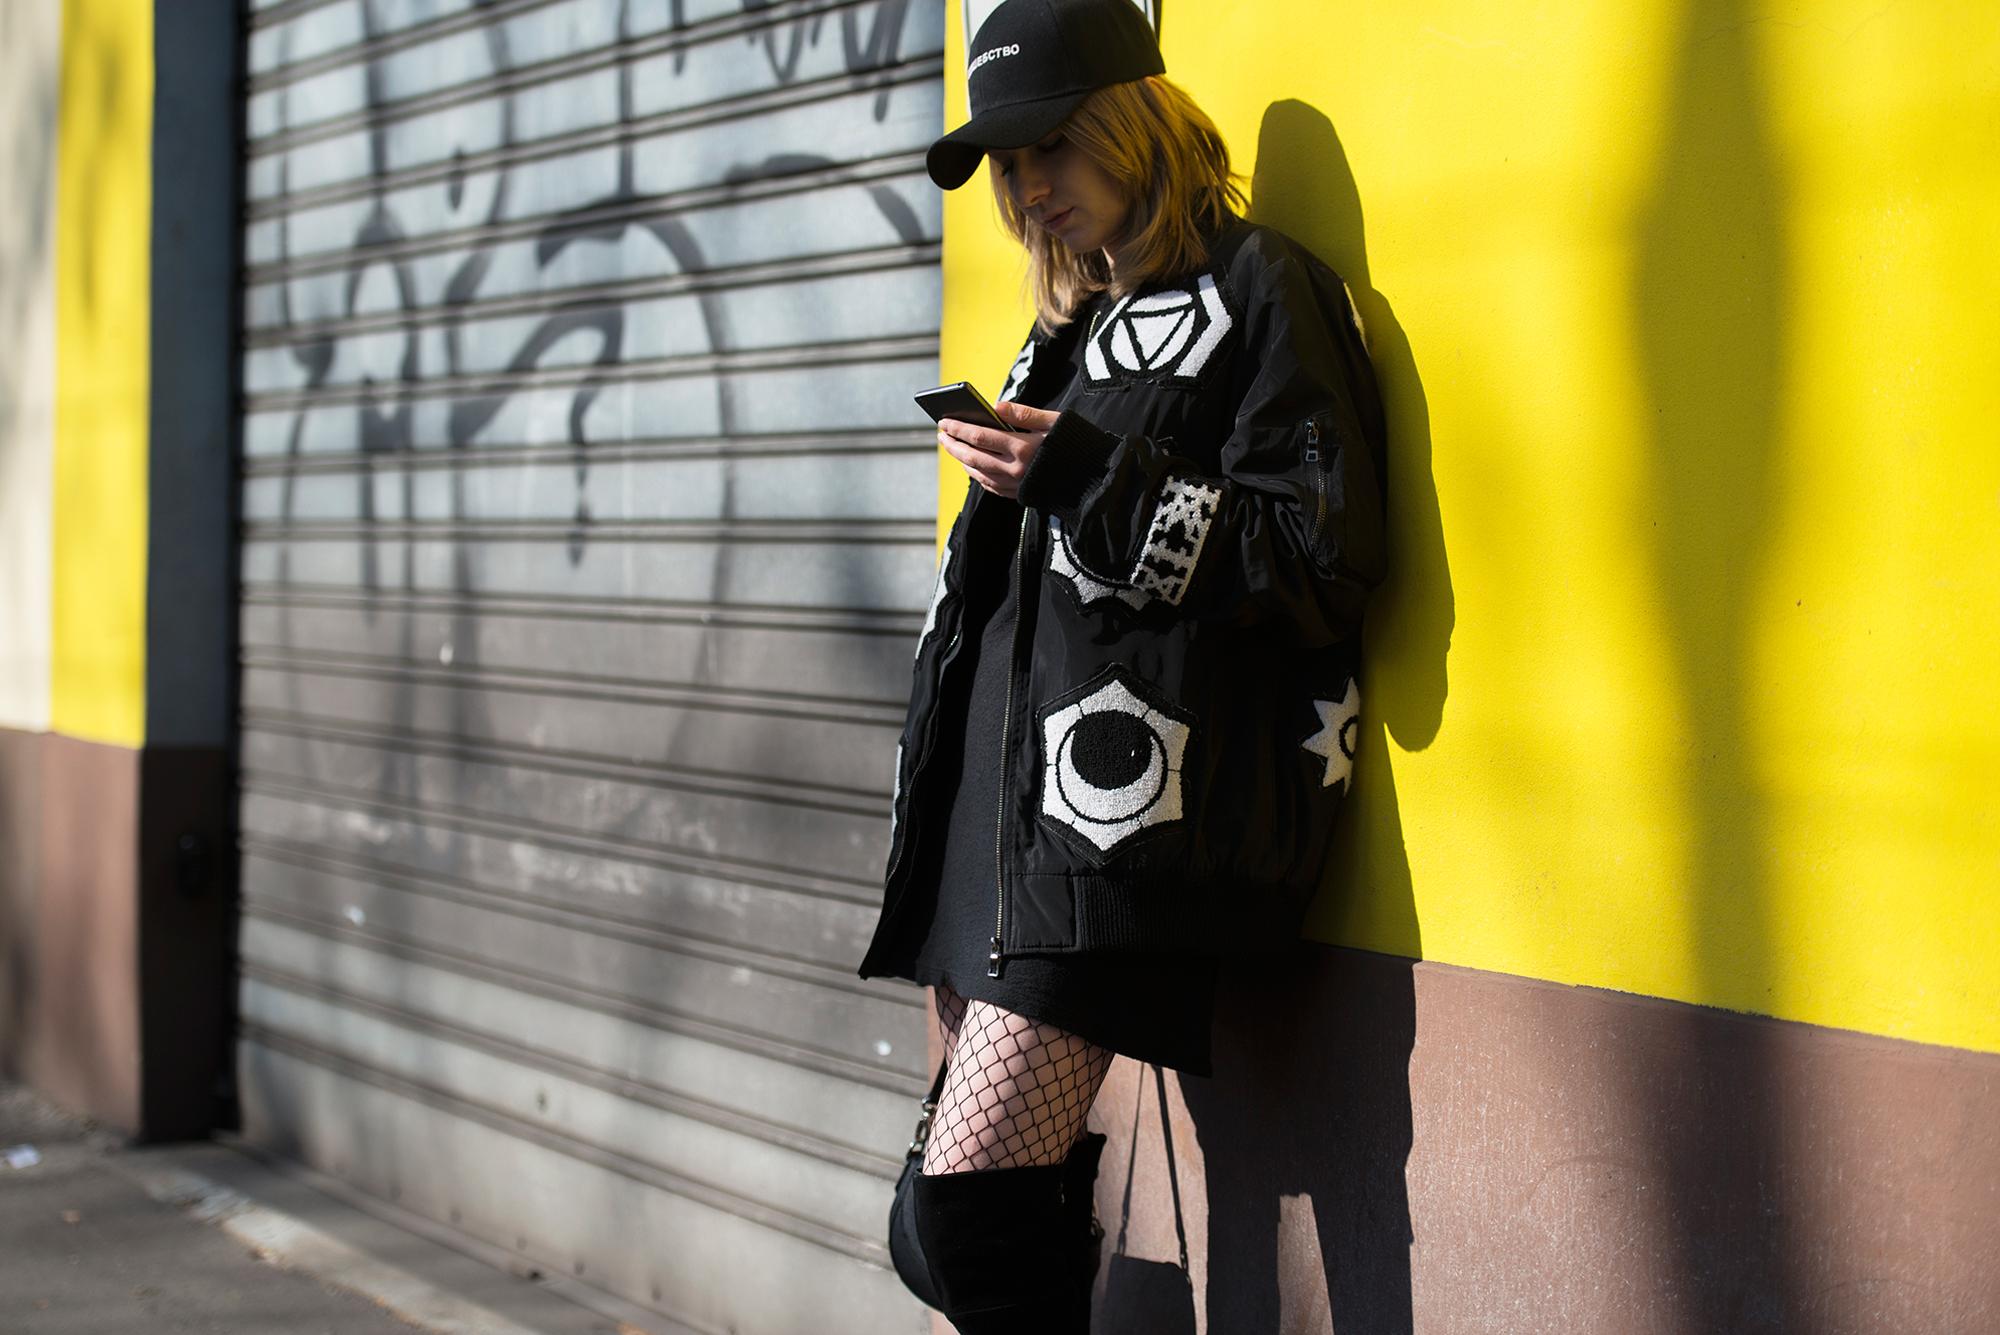 Streetsnaps Milan Fashion Week February 2017 - 3739922